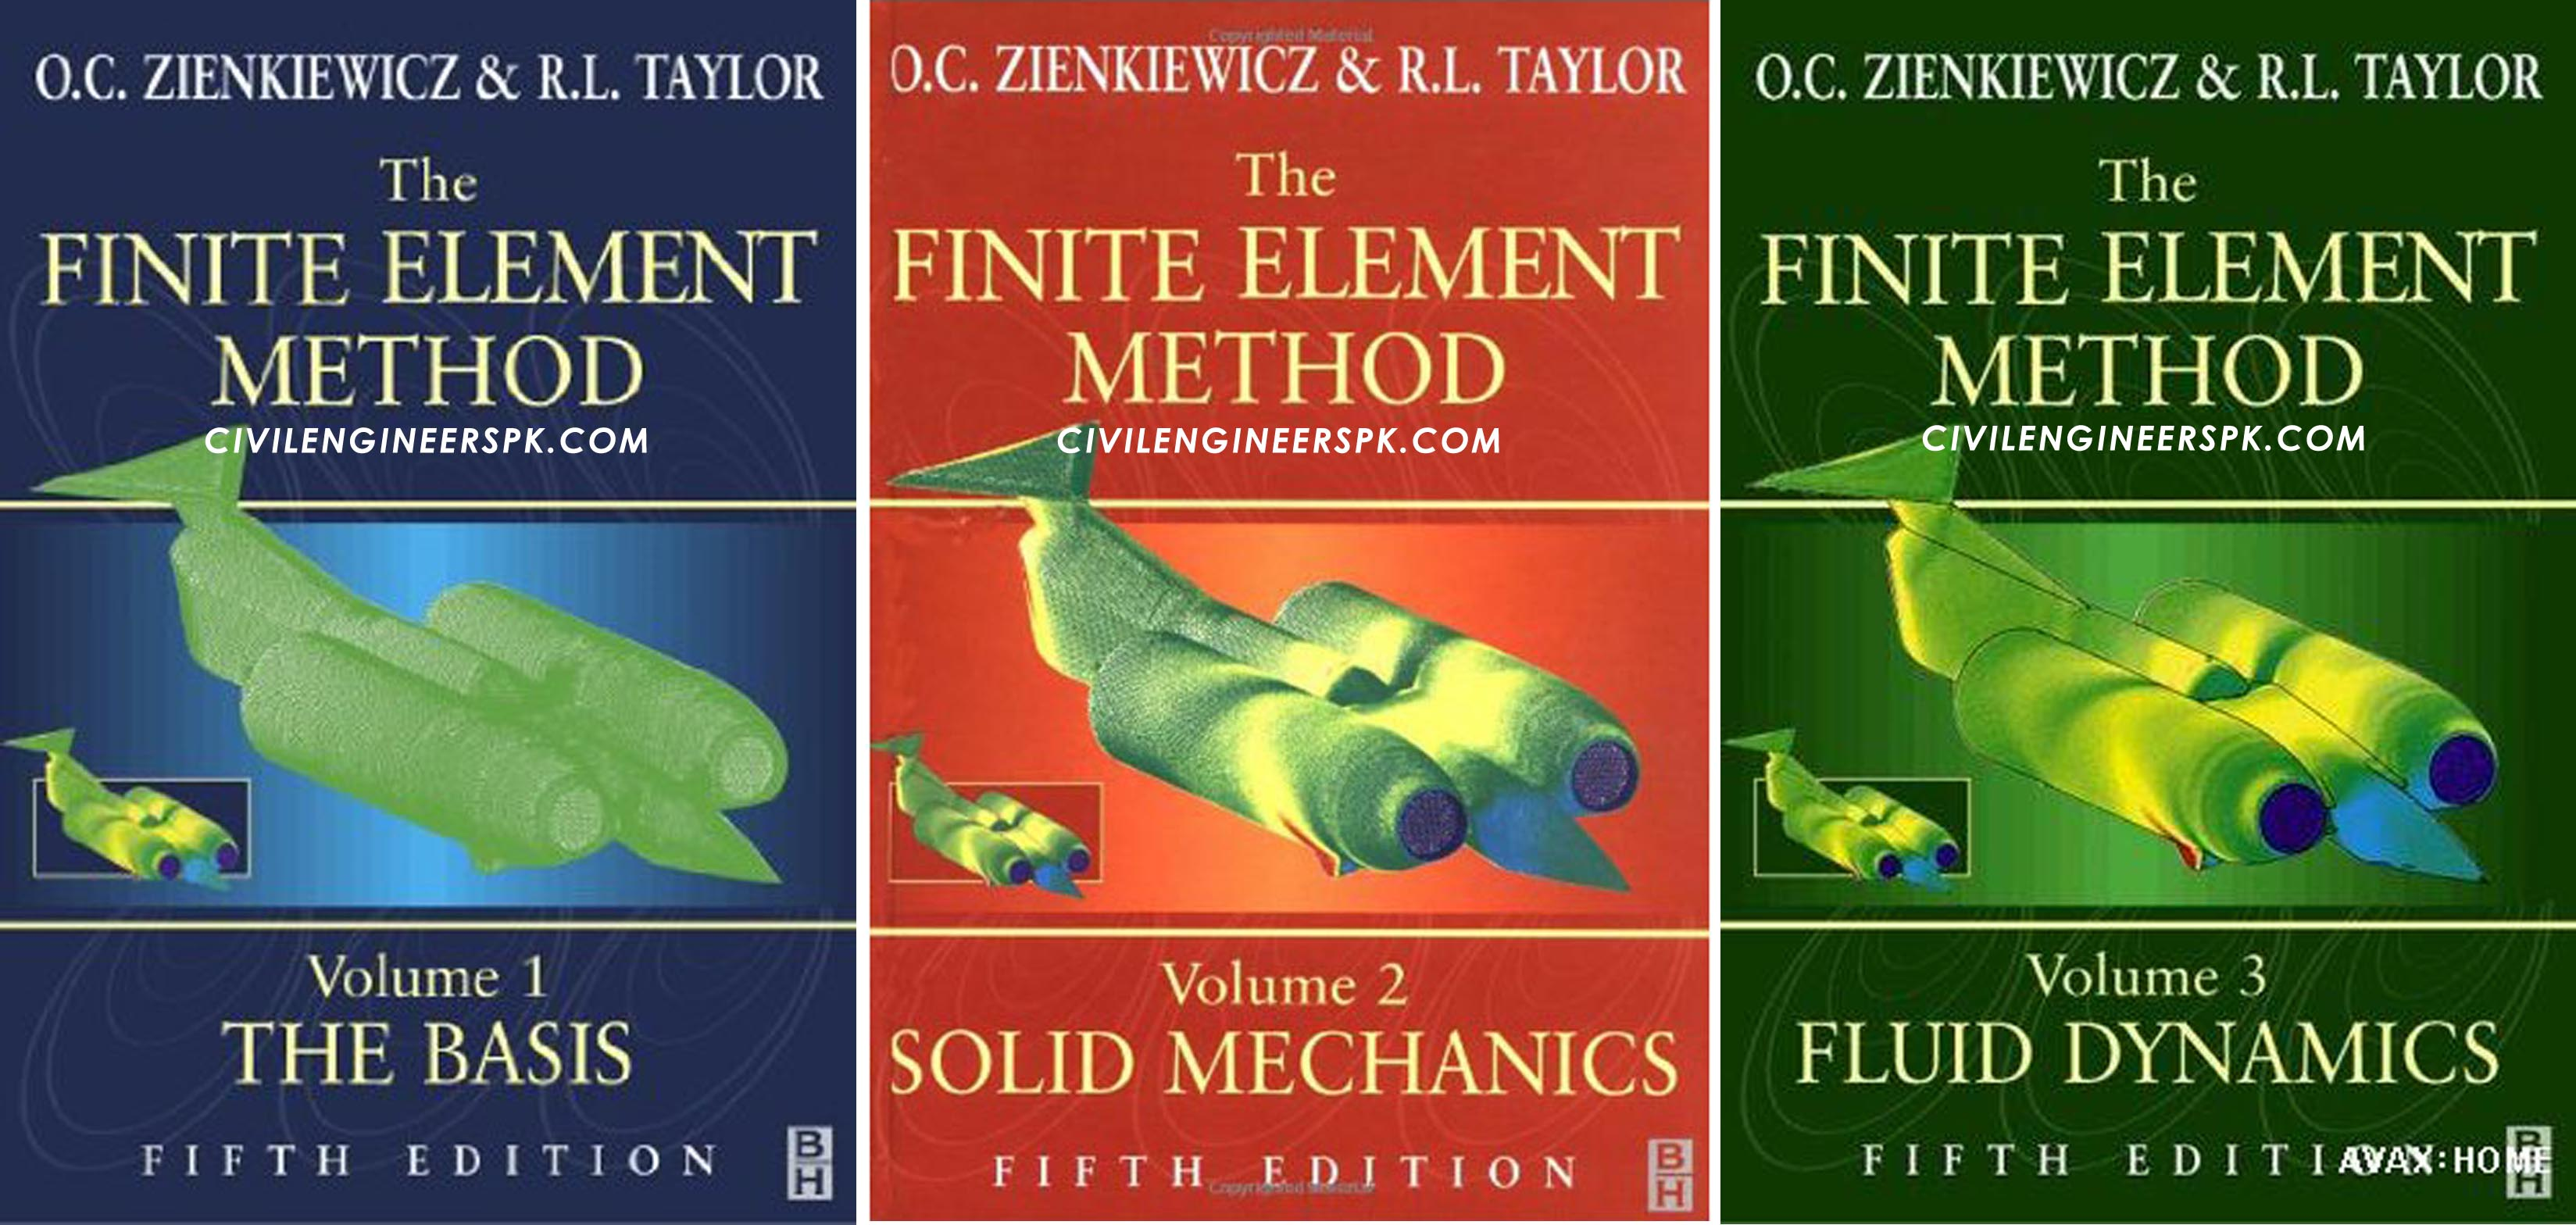 Finite Element Method: Volume 3, Fifth Edition